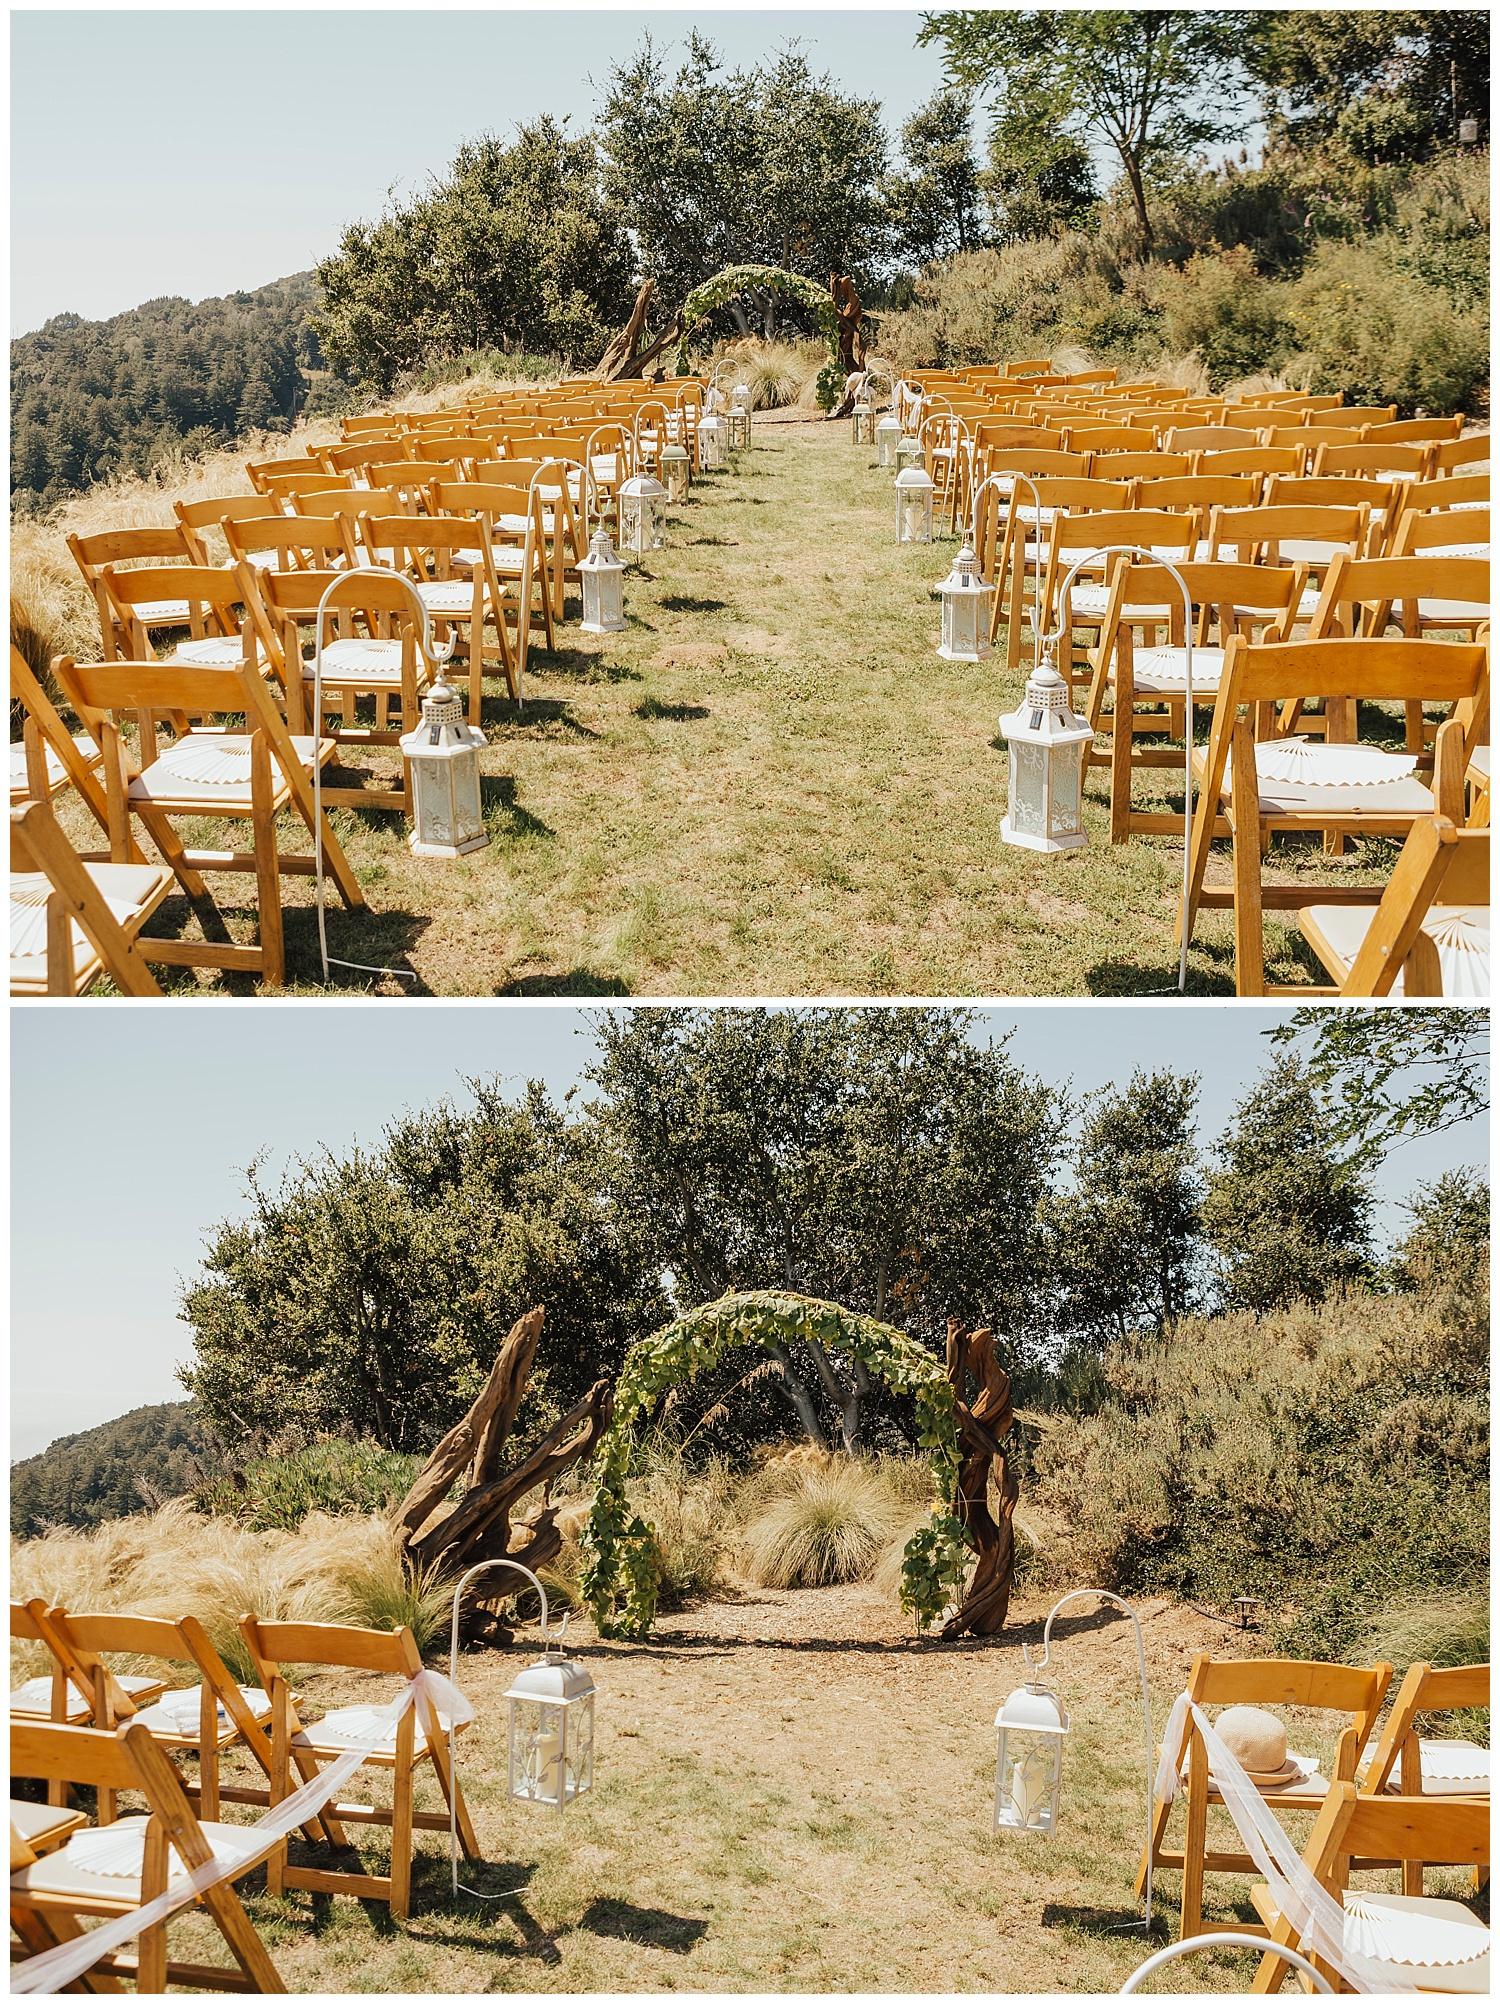 big-sur-wedding-ceremony-location-carol-oliva-photography.jpg